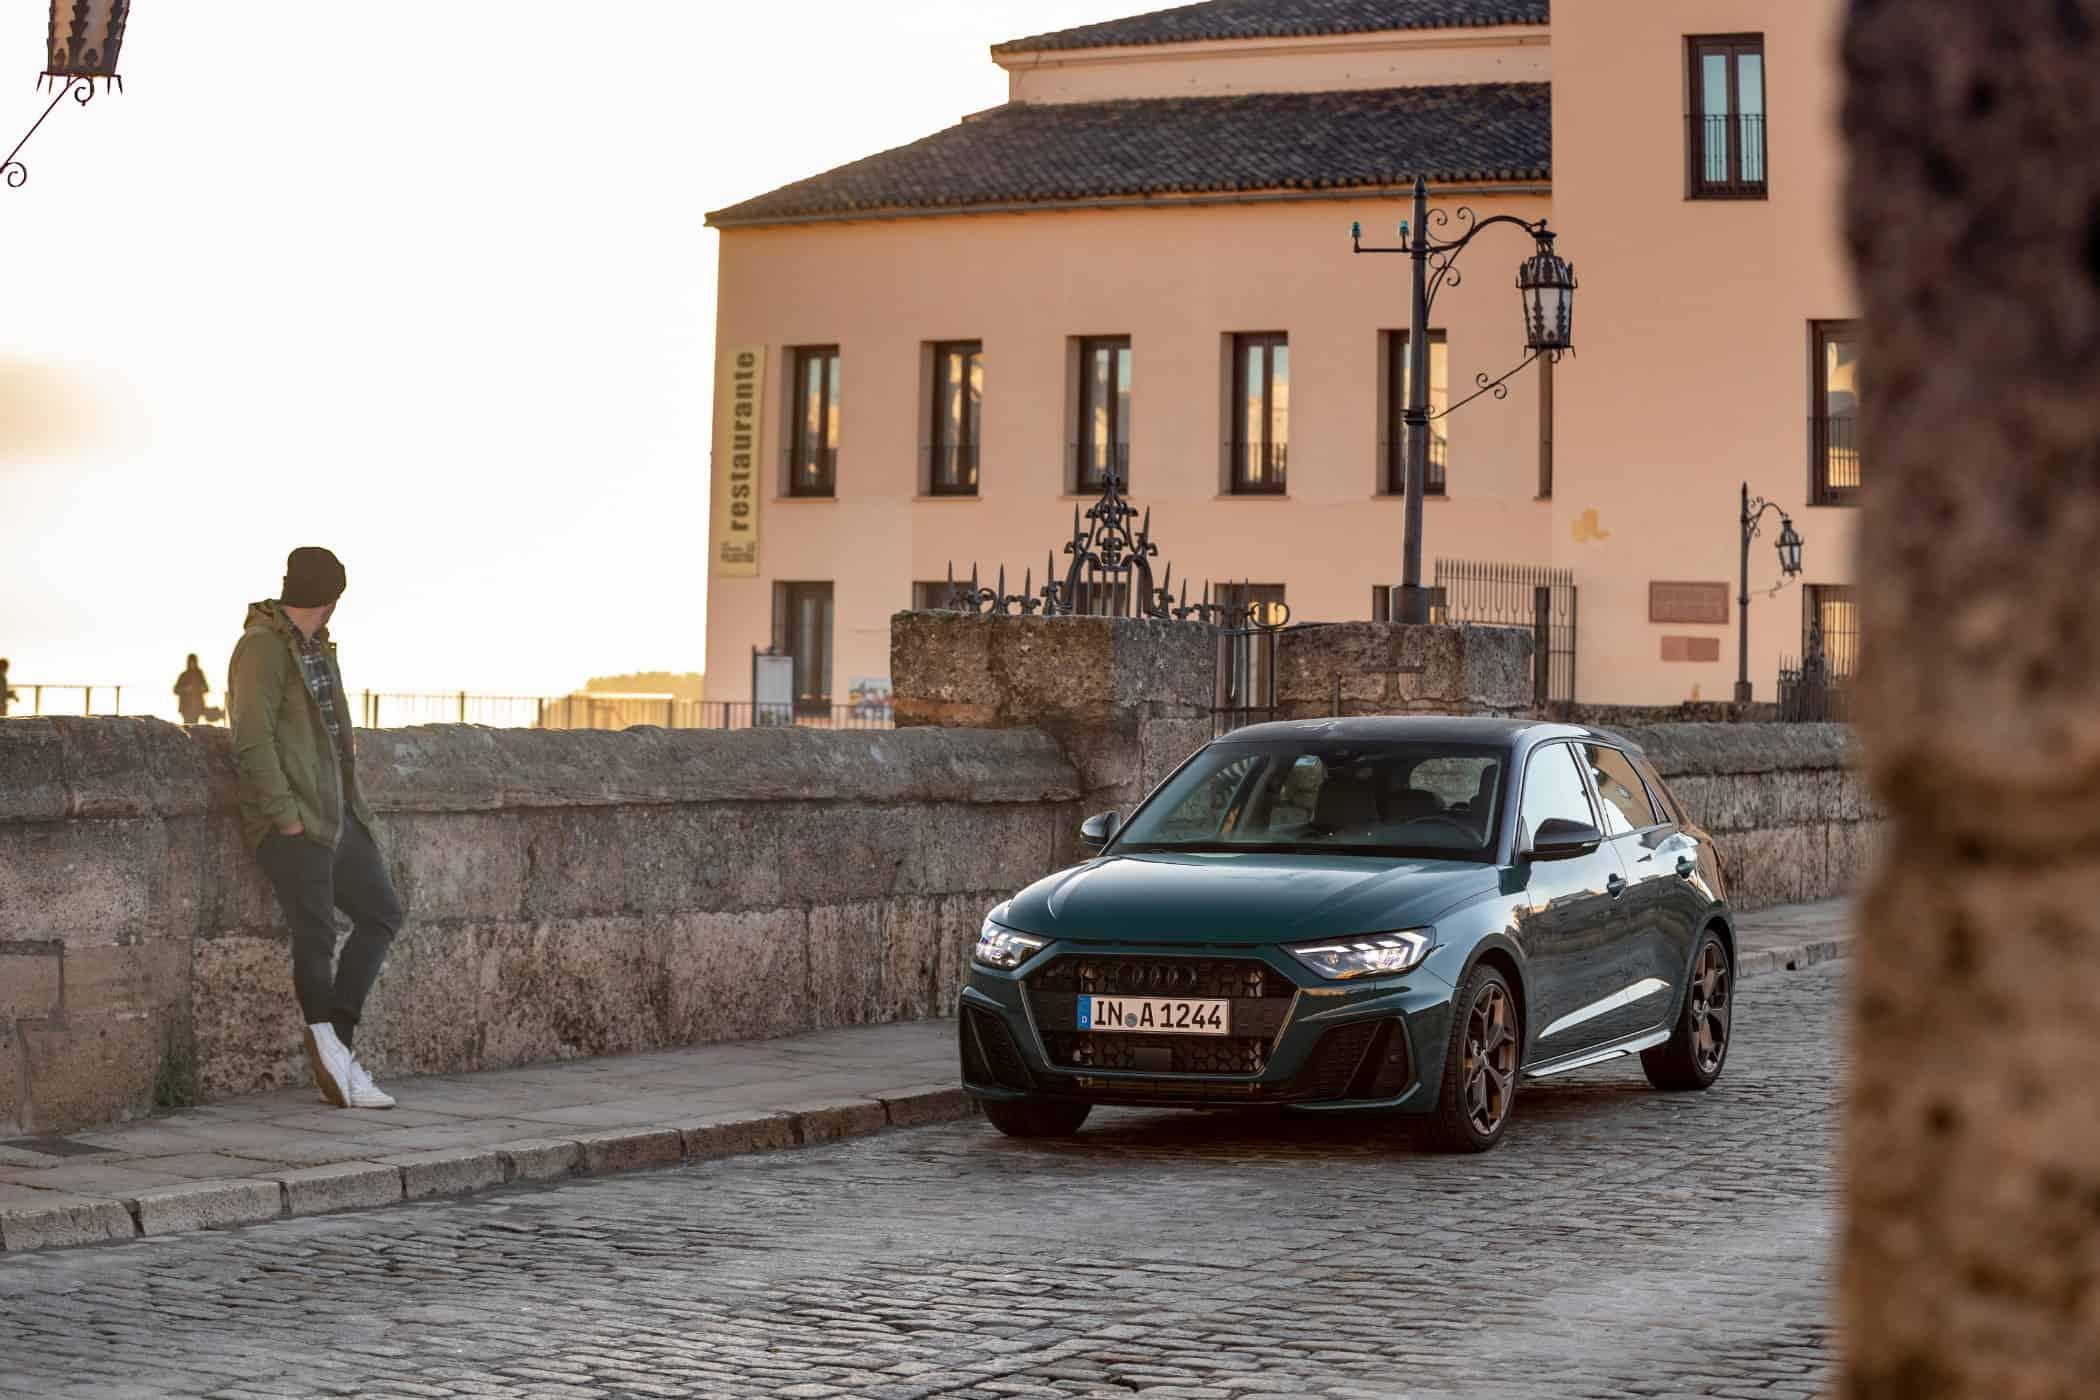 Audi A1, Jan Weizenecker